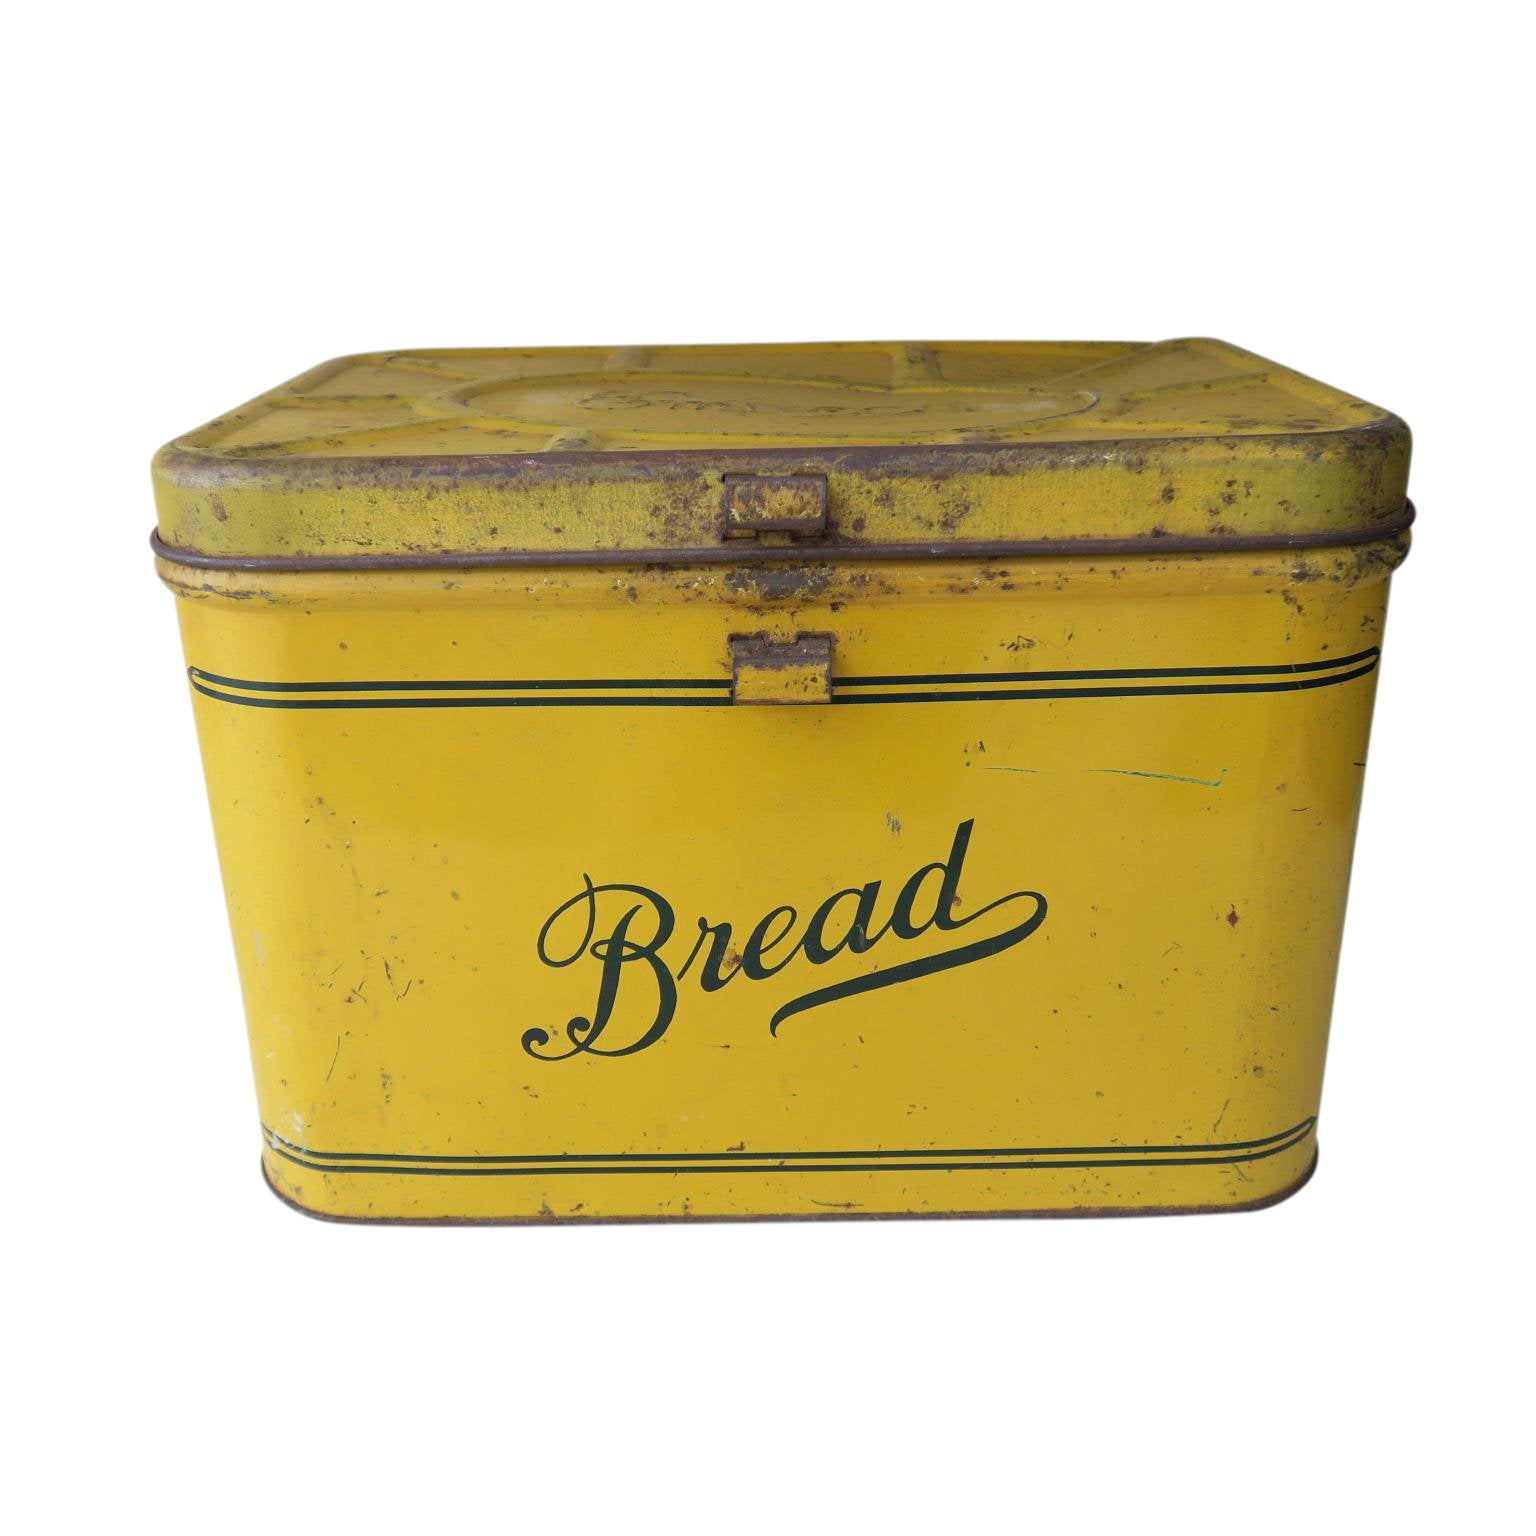 Antique Empeco Yellow Metal Bread Box Kitchen Decor Chairish